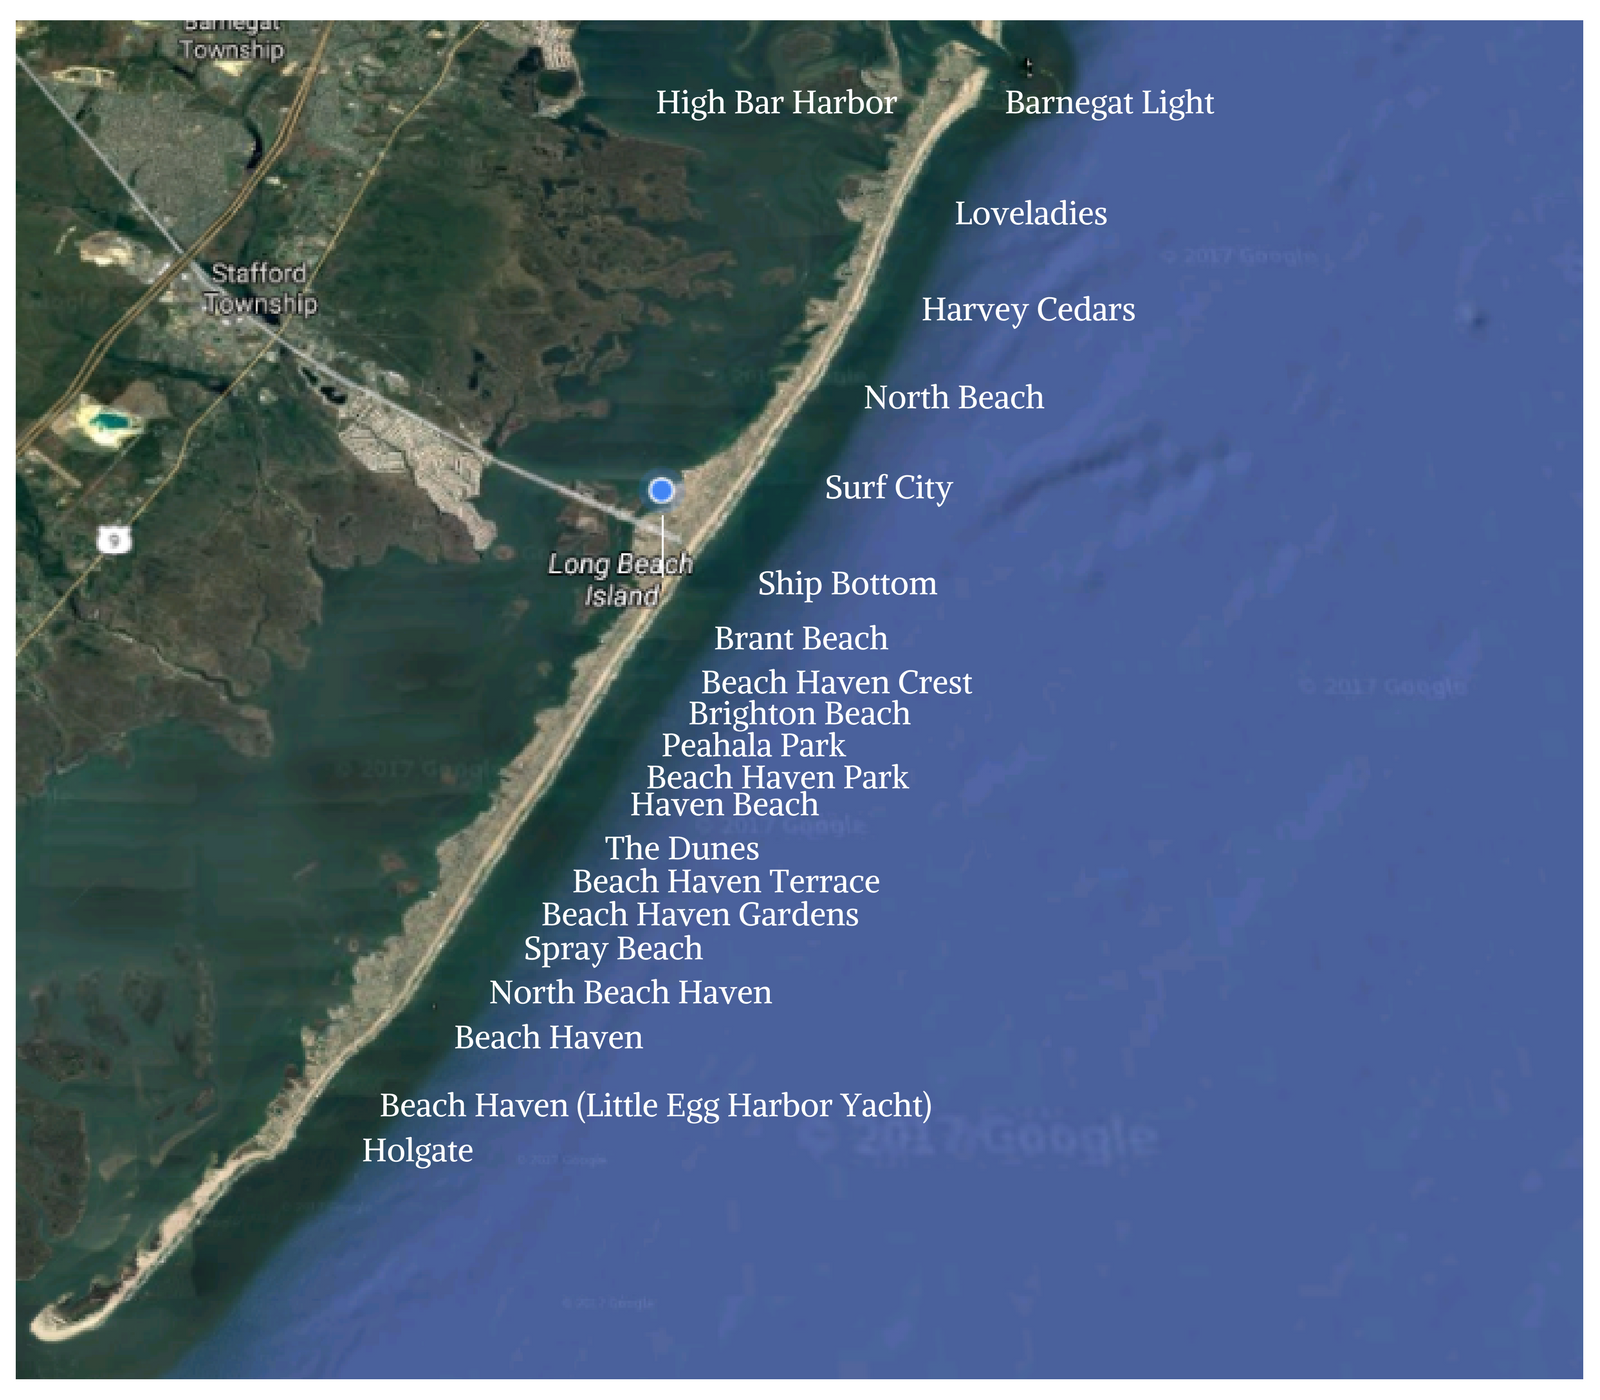 Island Beach State Park Nj: Jersea Realty LBI Homes -Long Beach Island